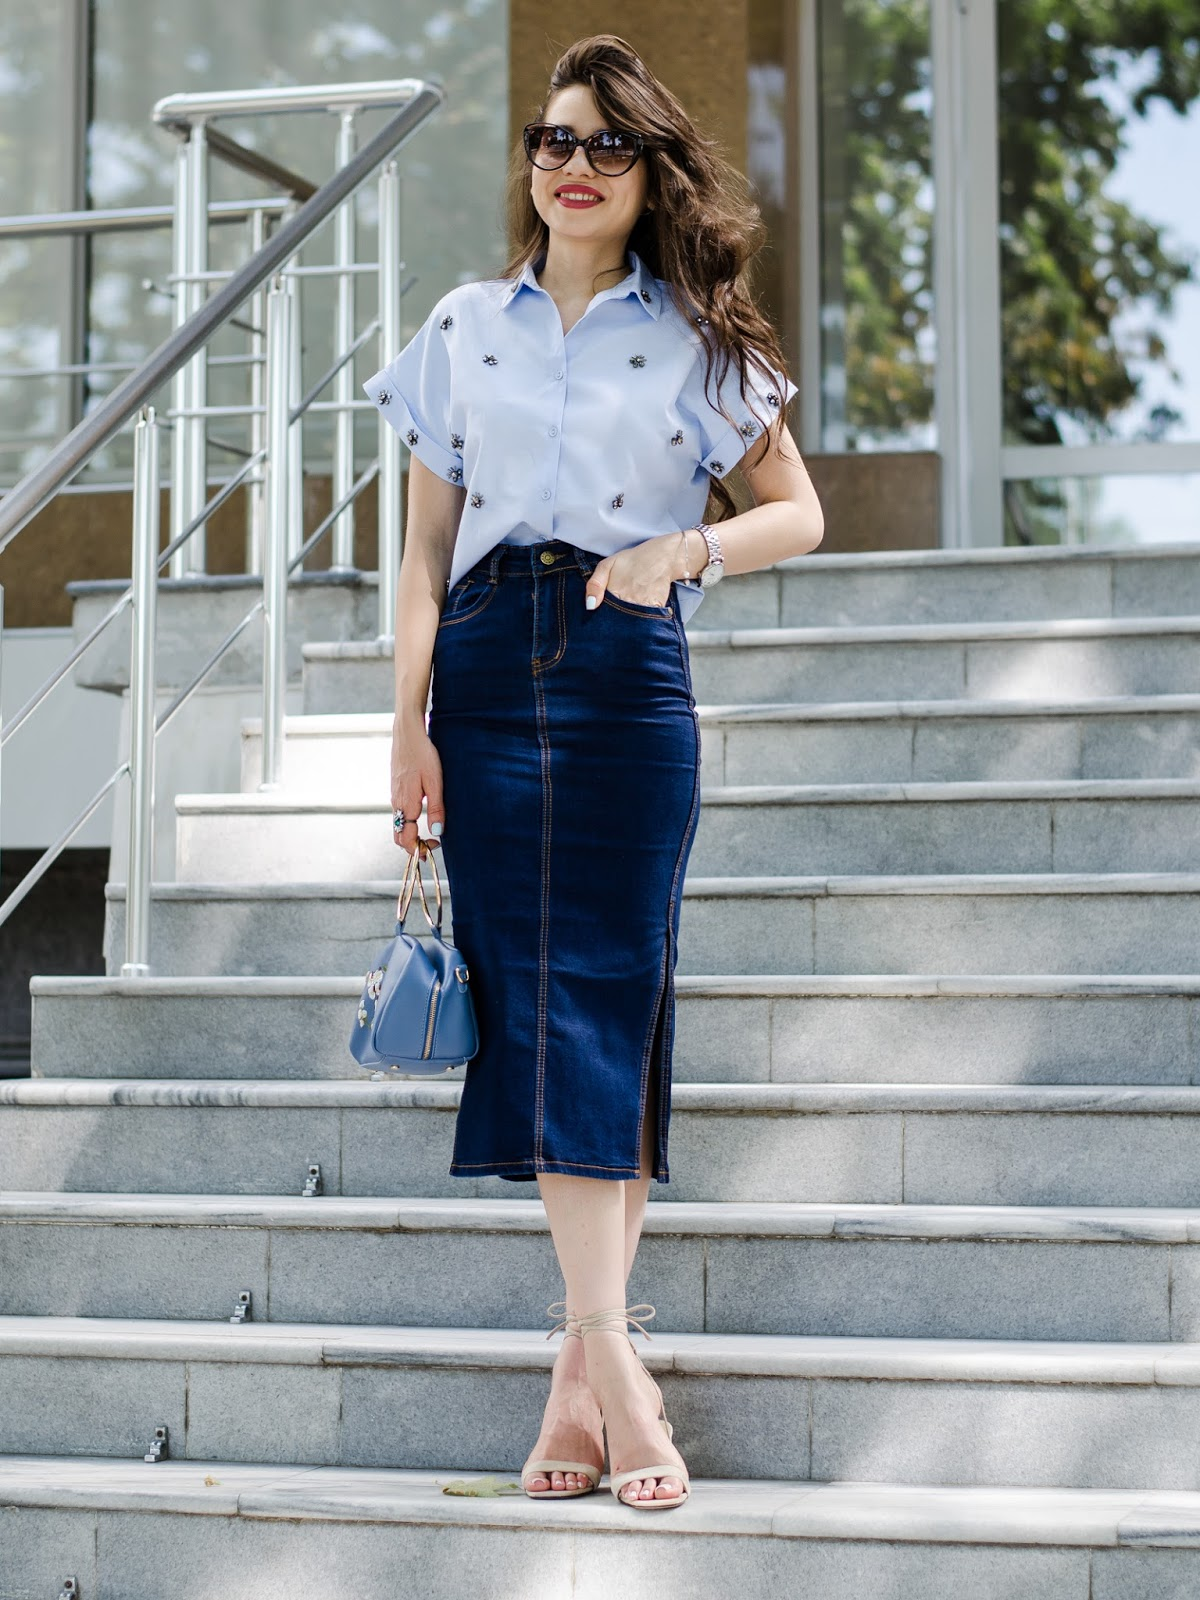 fashion blogger diyorasnotes diyora beta midi skirt denim skirt shirt heeled sandals casual chic work outfit